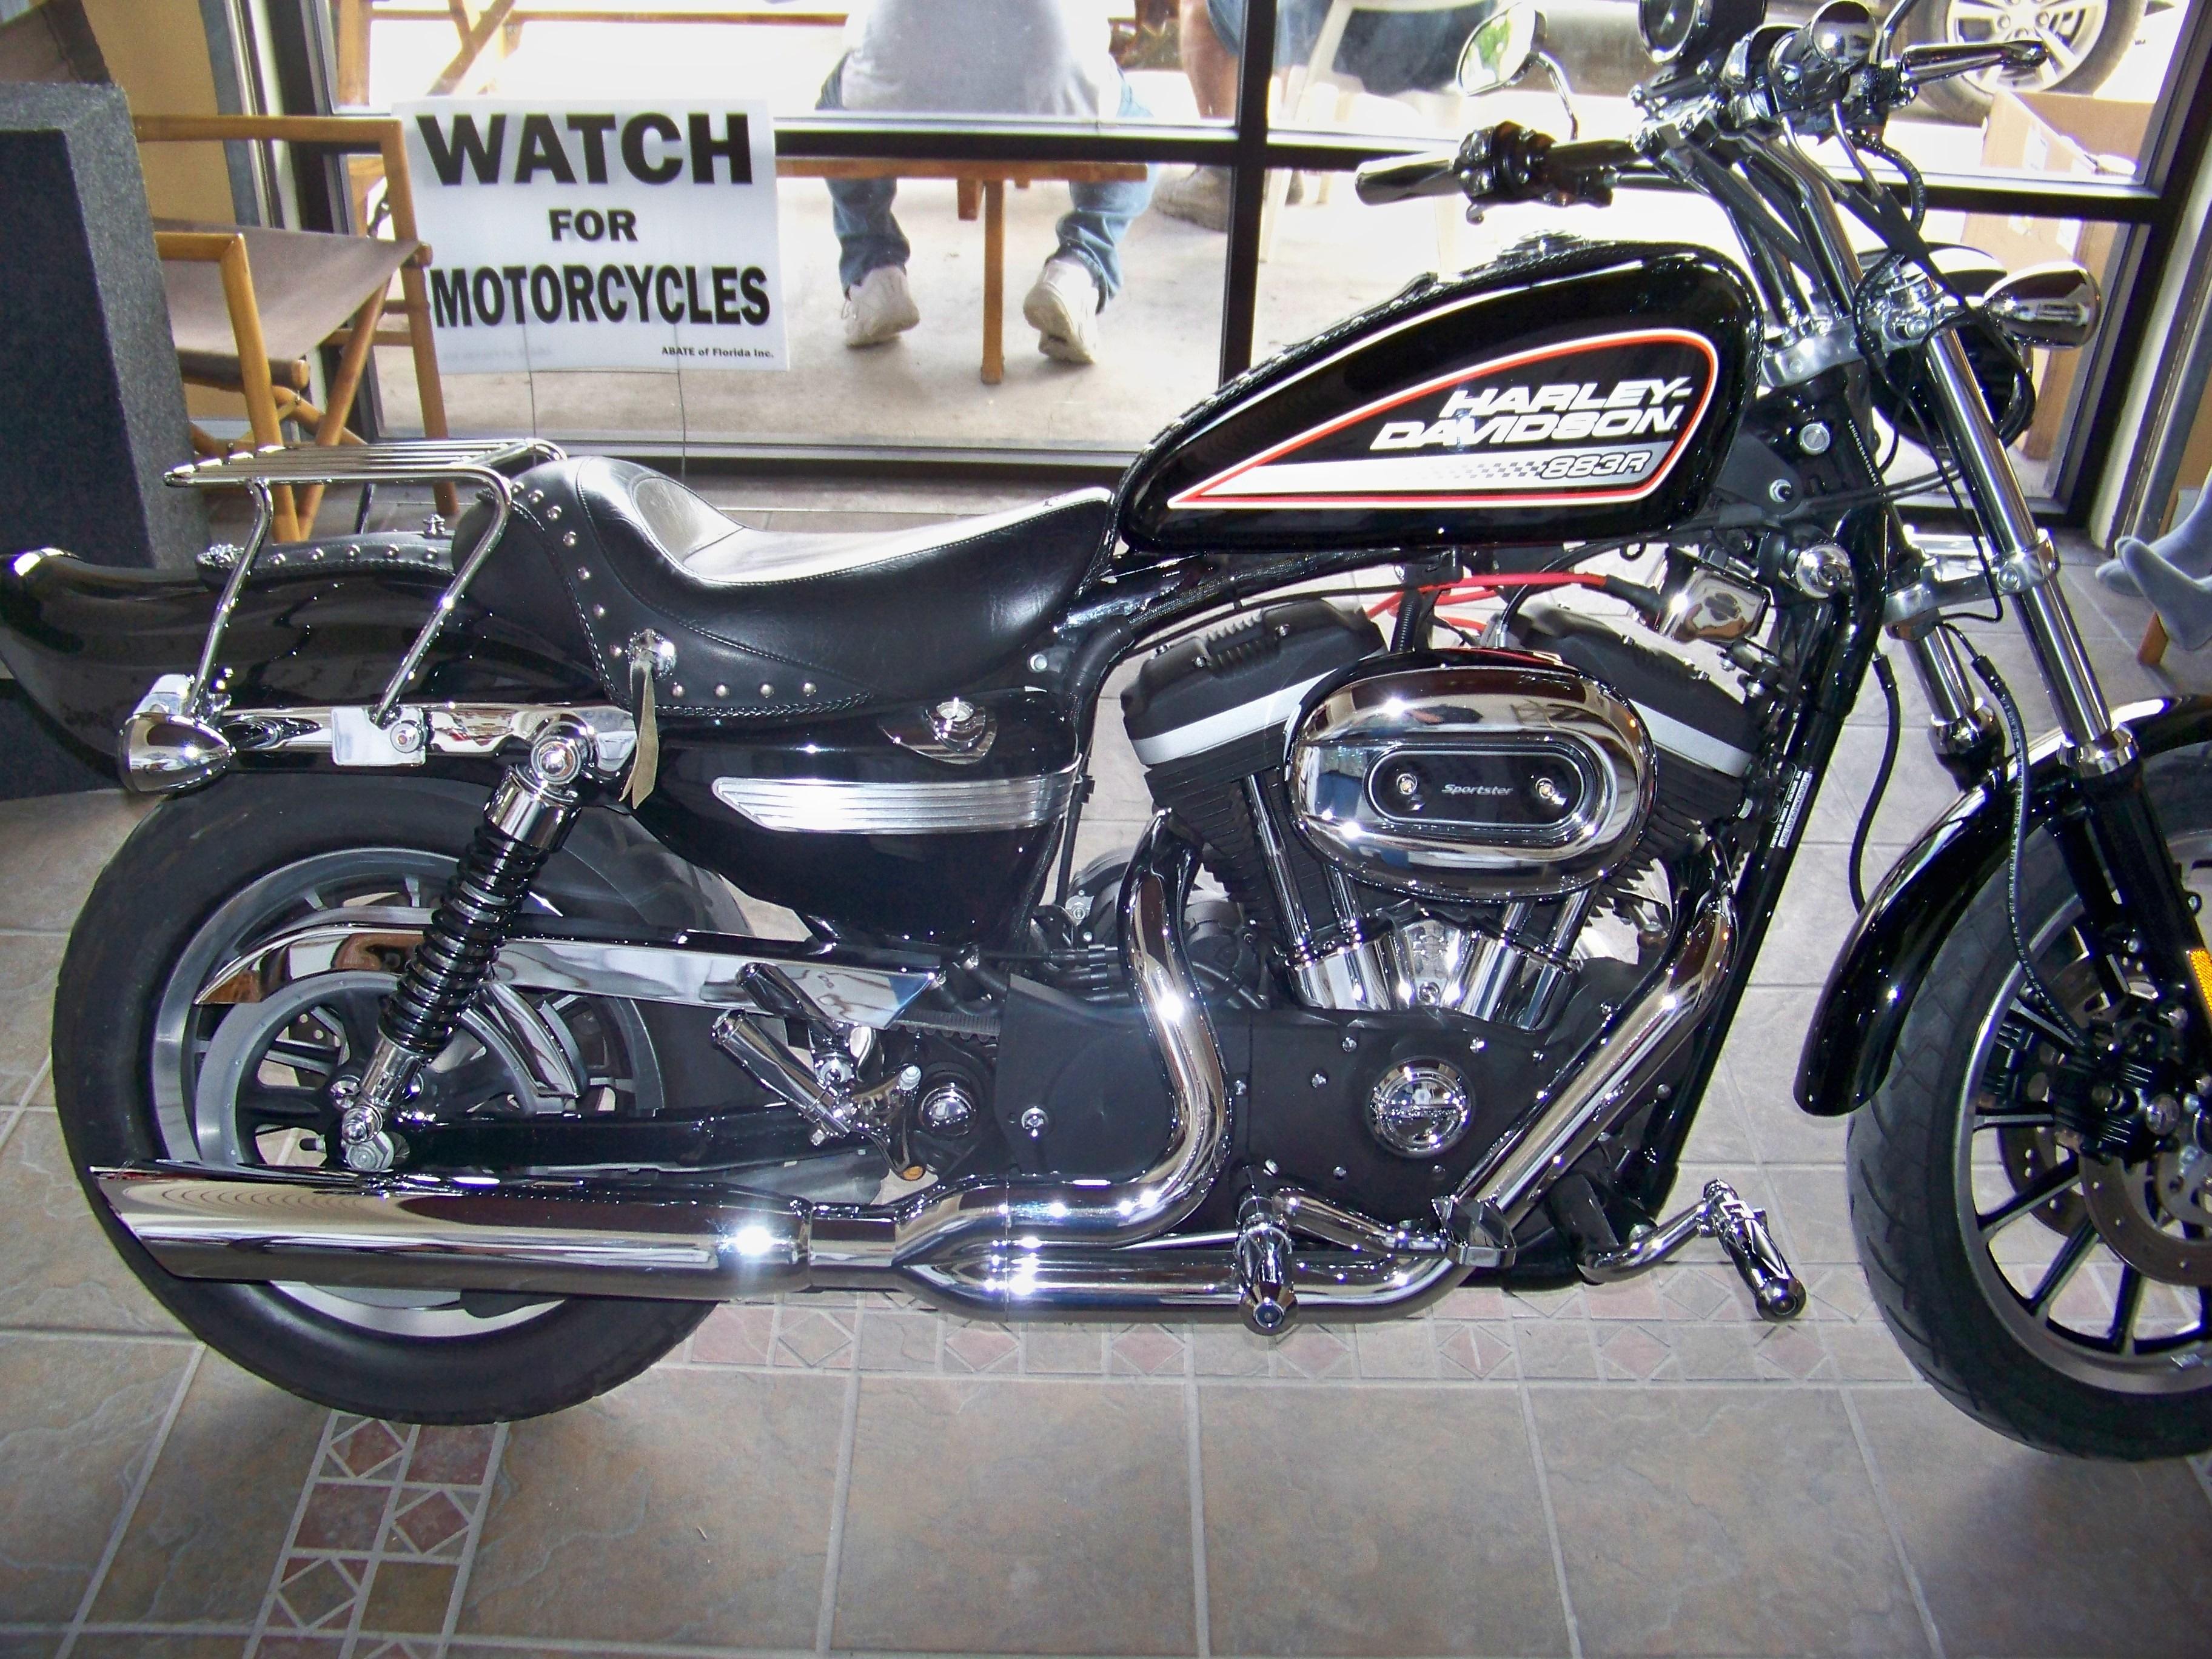 2005 Harley Davidson 174 Xl883r Sportster 174 883 Roadster